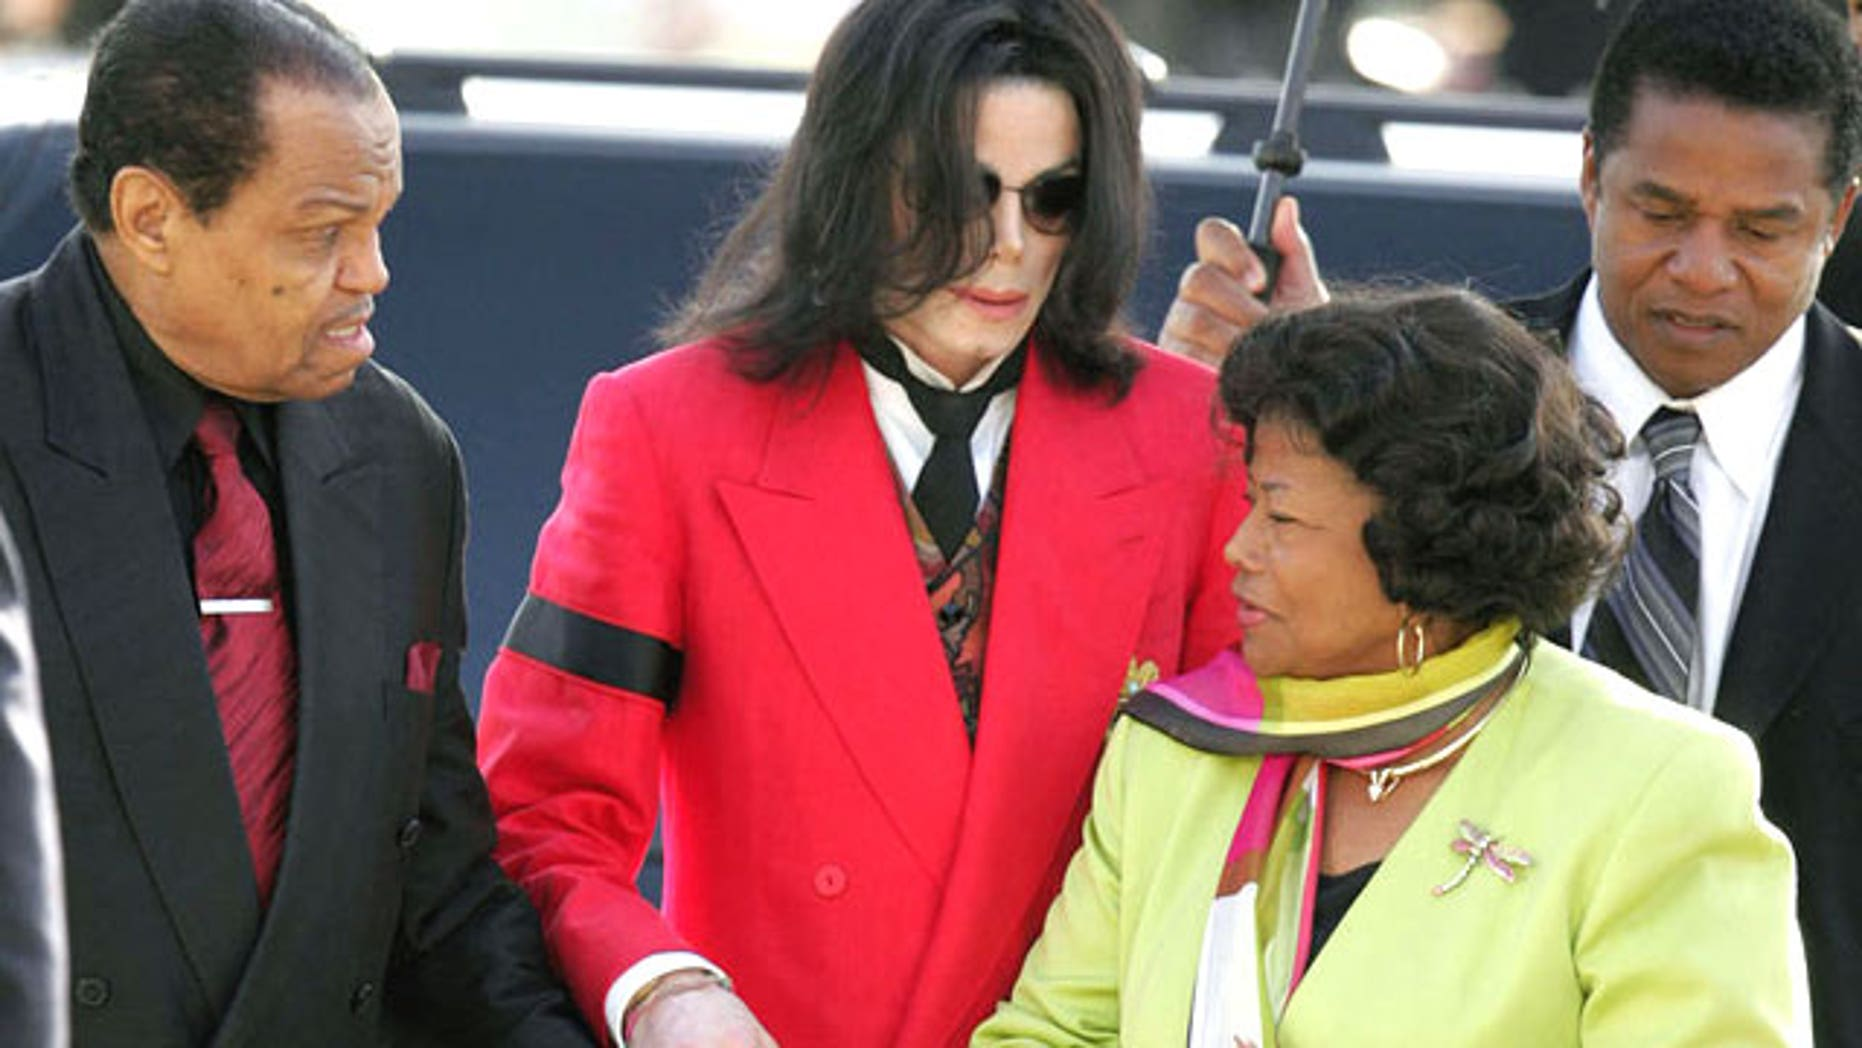 Joseph Jackson, Michael Jackson, Katherine Jackson, and Jackie Jackson arrive at Santa Barbara County Superior Court for Michael's molestation trial on March 14, 2005. (AP)